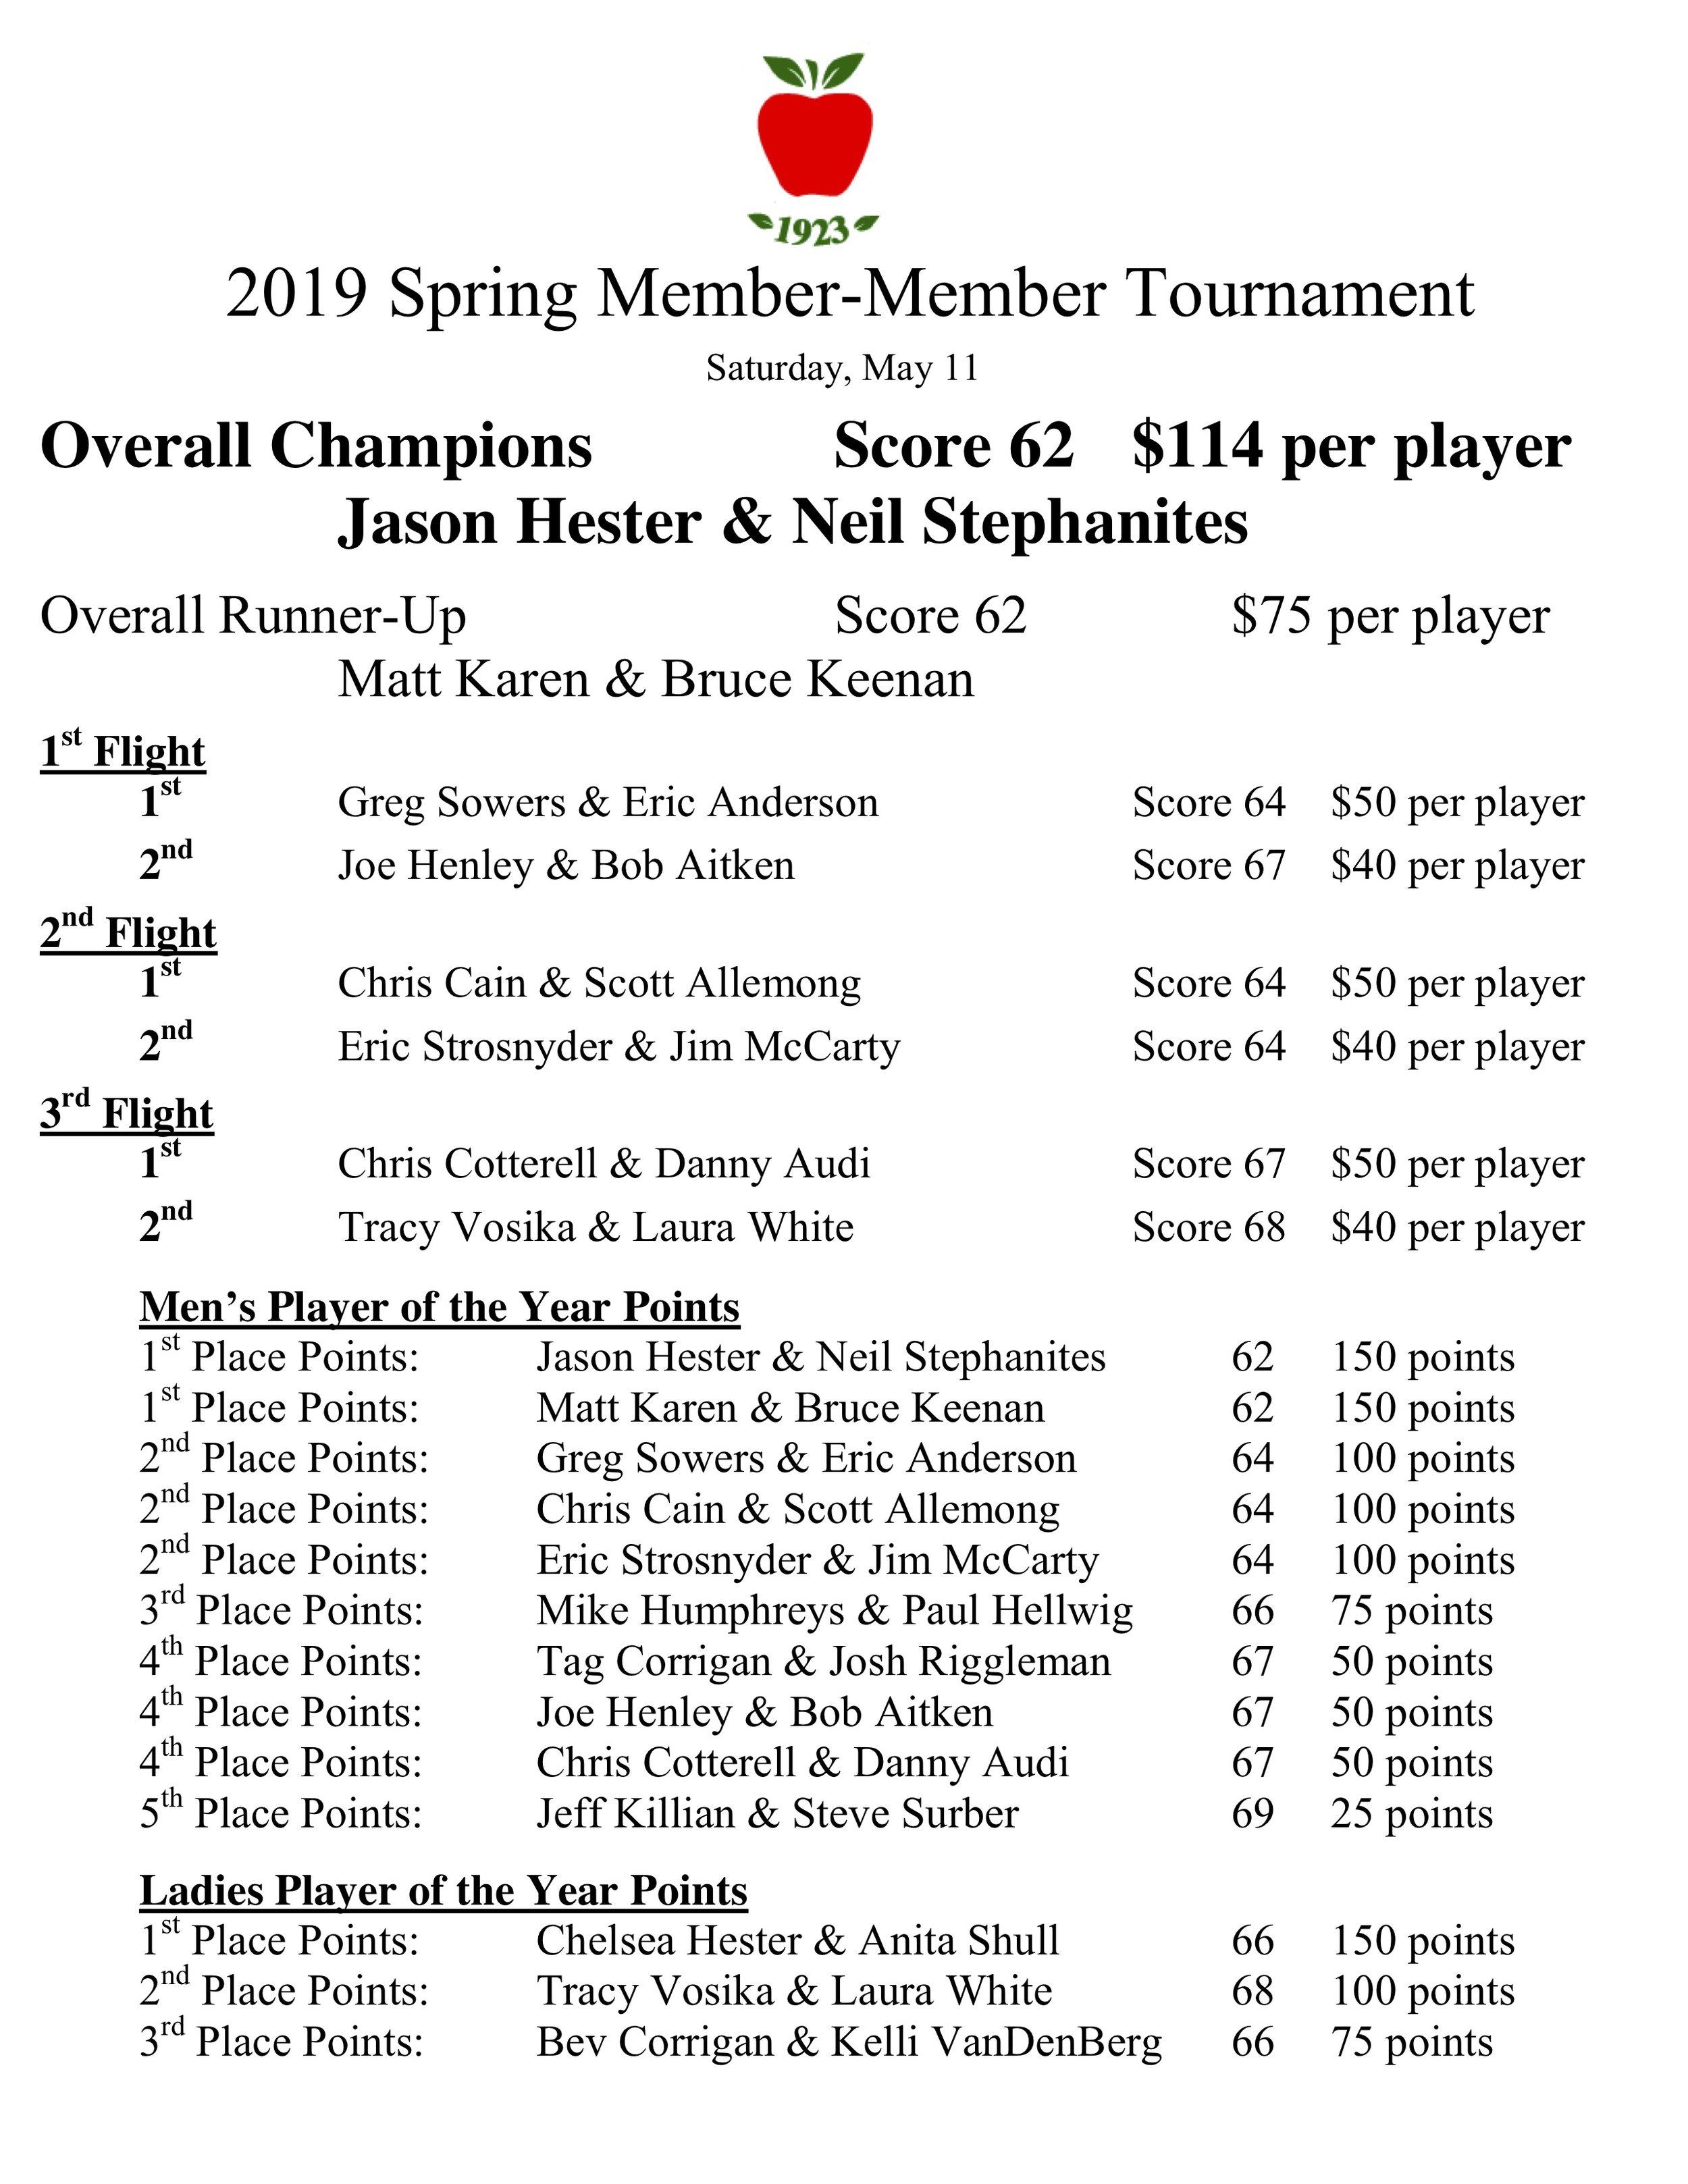 2019 spring member member results.jpg